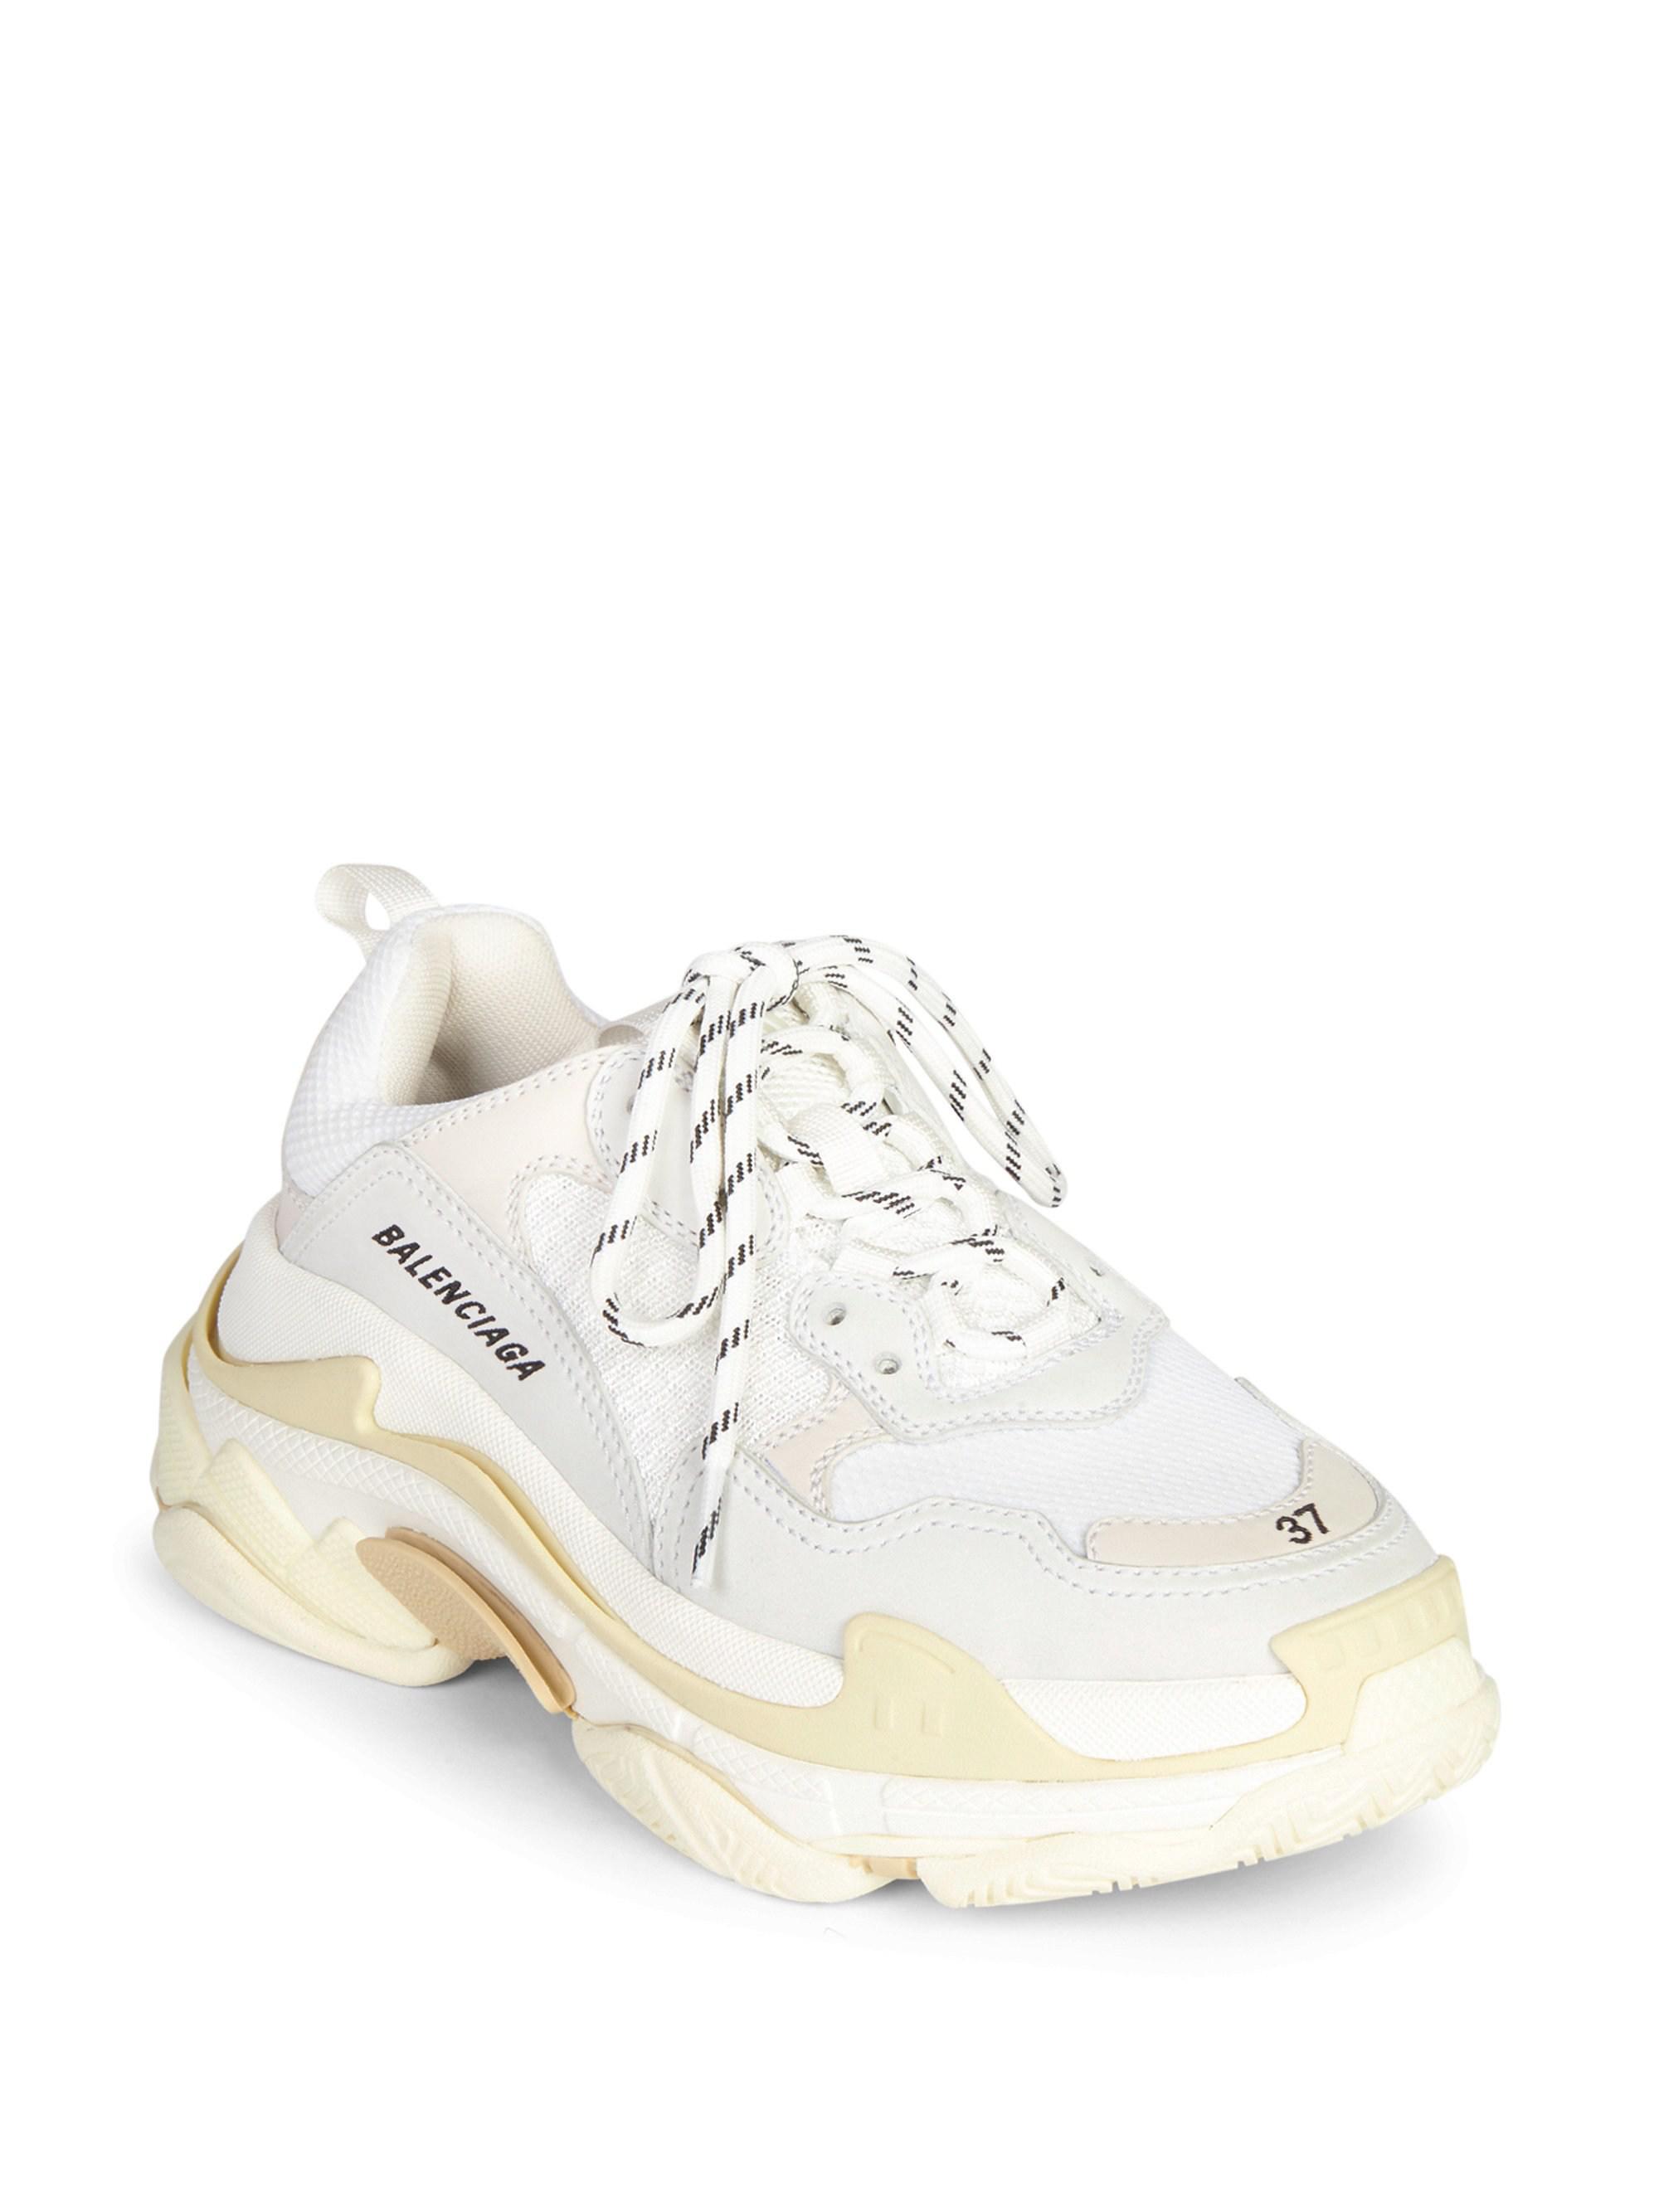 290eeb7e216c ... separation shoes 99d62 7341a Balenciaga - White Triple S Trainer  Sneakers for Men - Lyst. ...